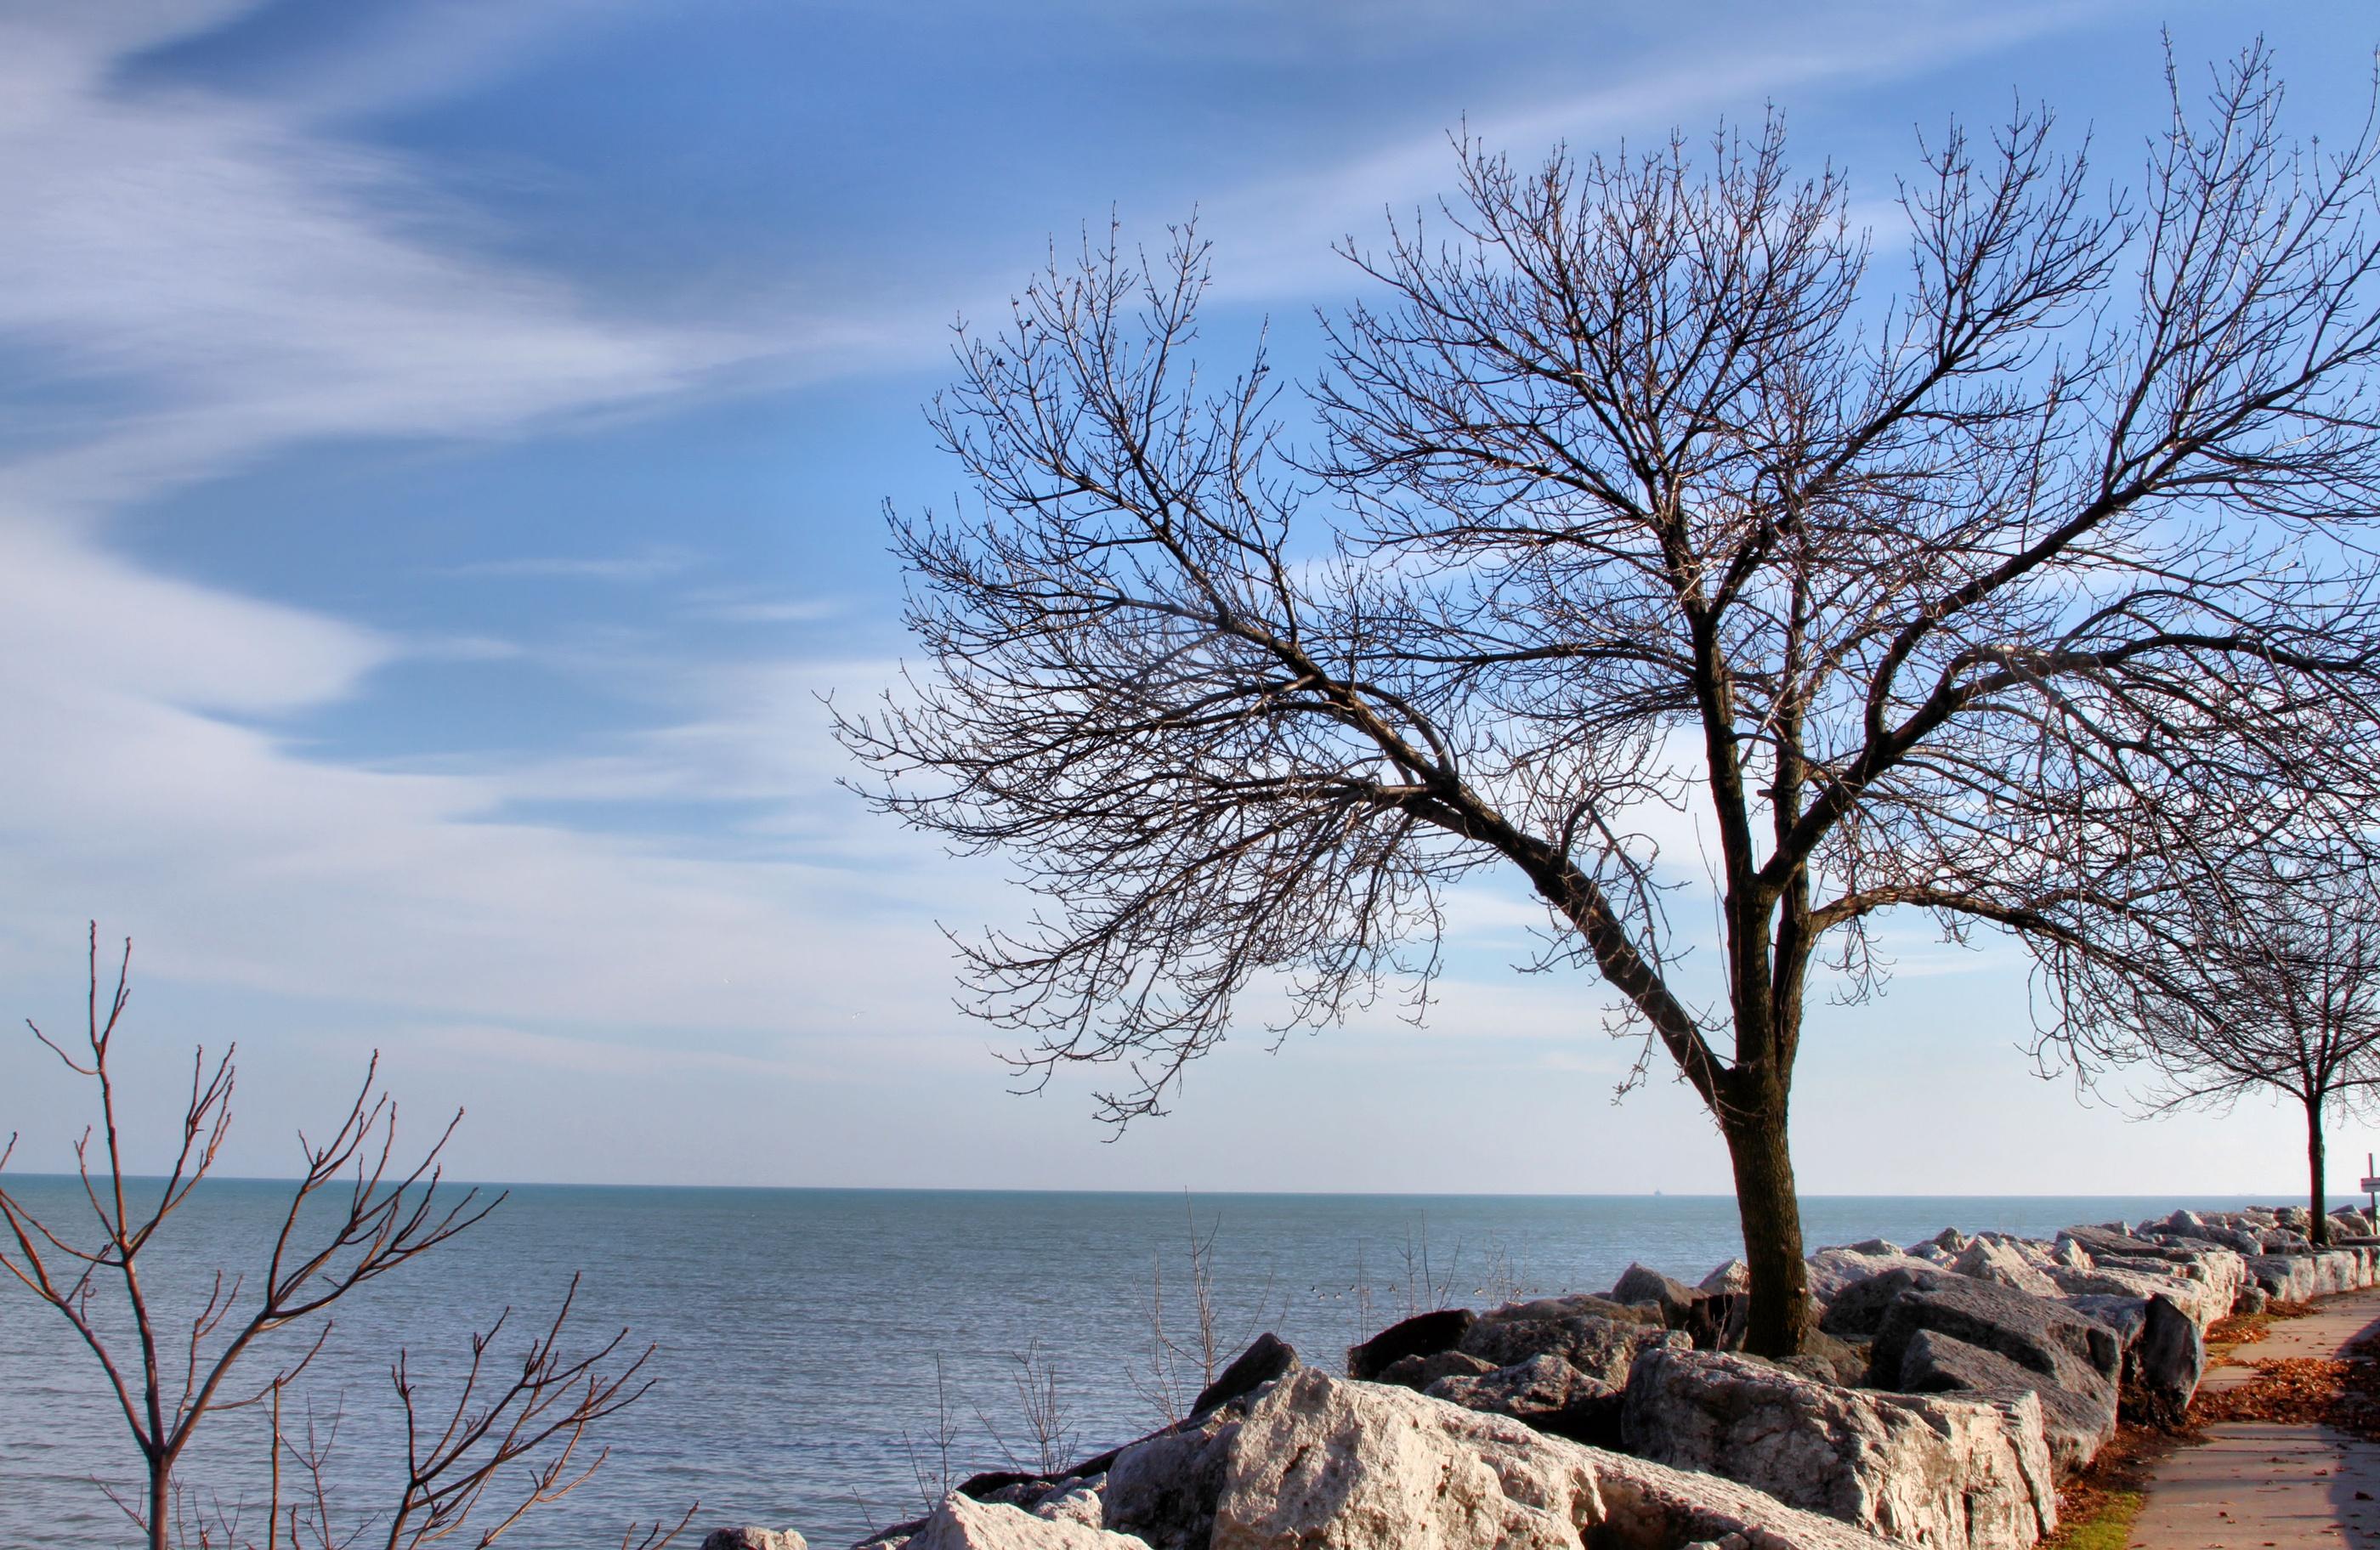 bigstock-A-Walk-by-Lake-Michigan-79216609.jpg